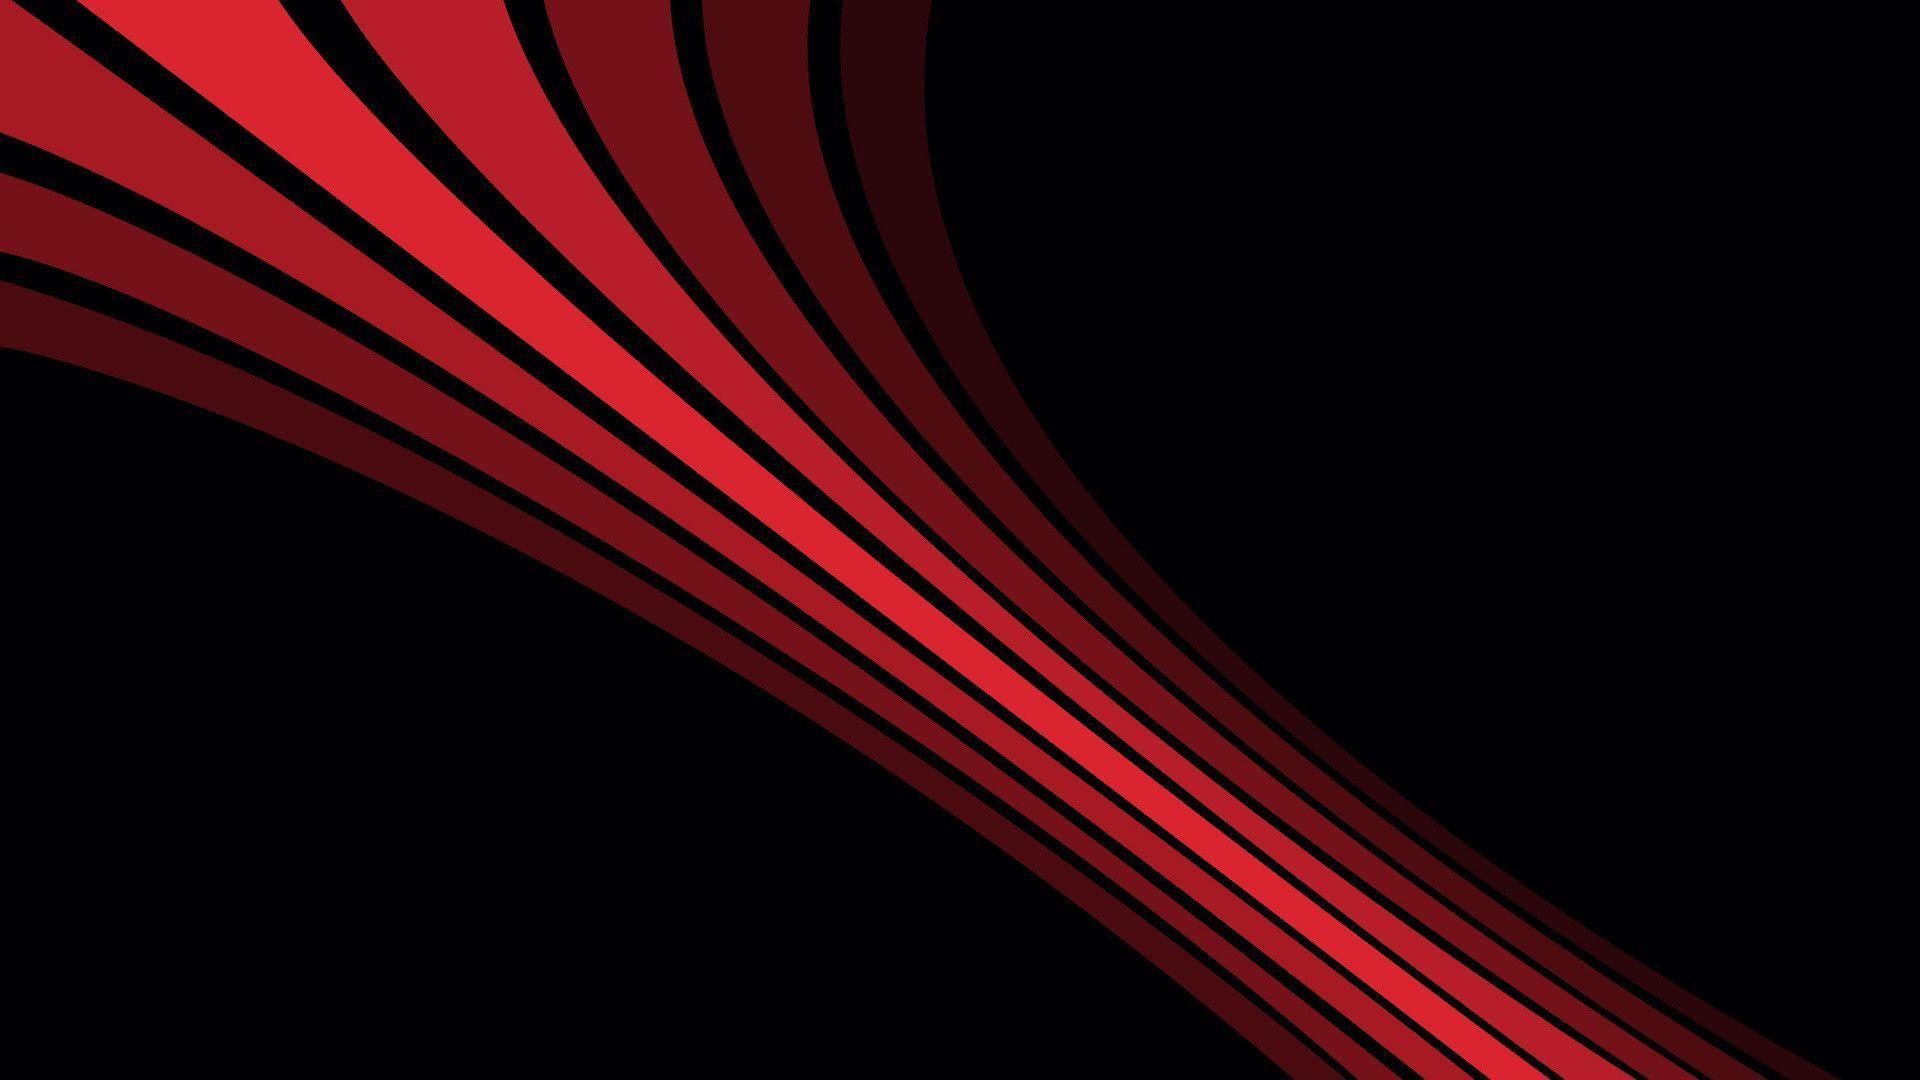 Black Red Smoke Images Wallpaper HD Resolution